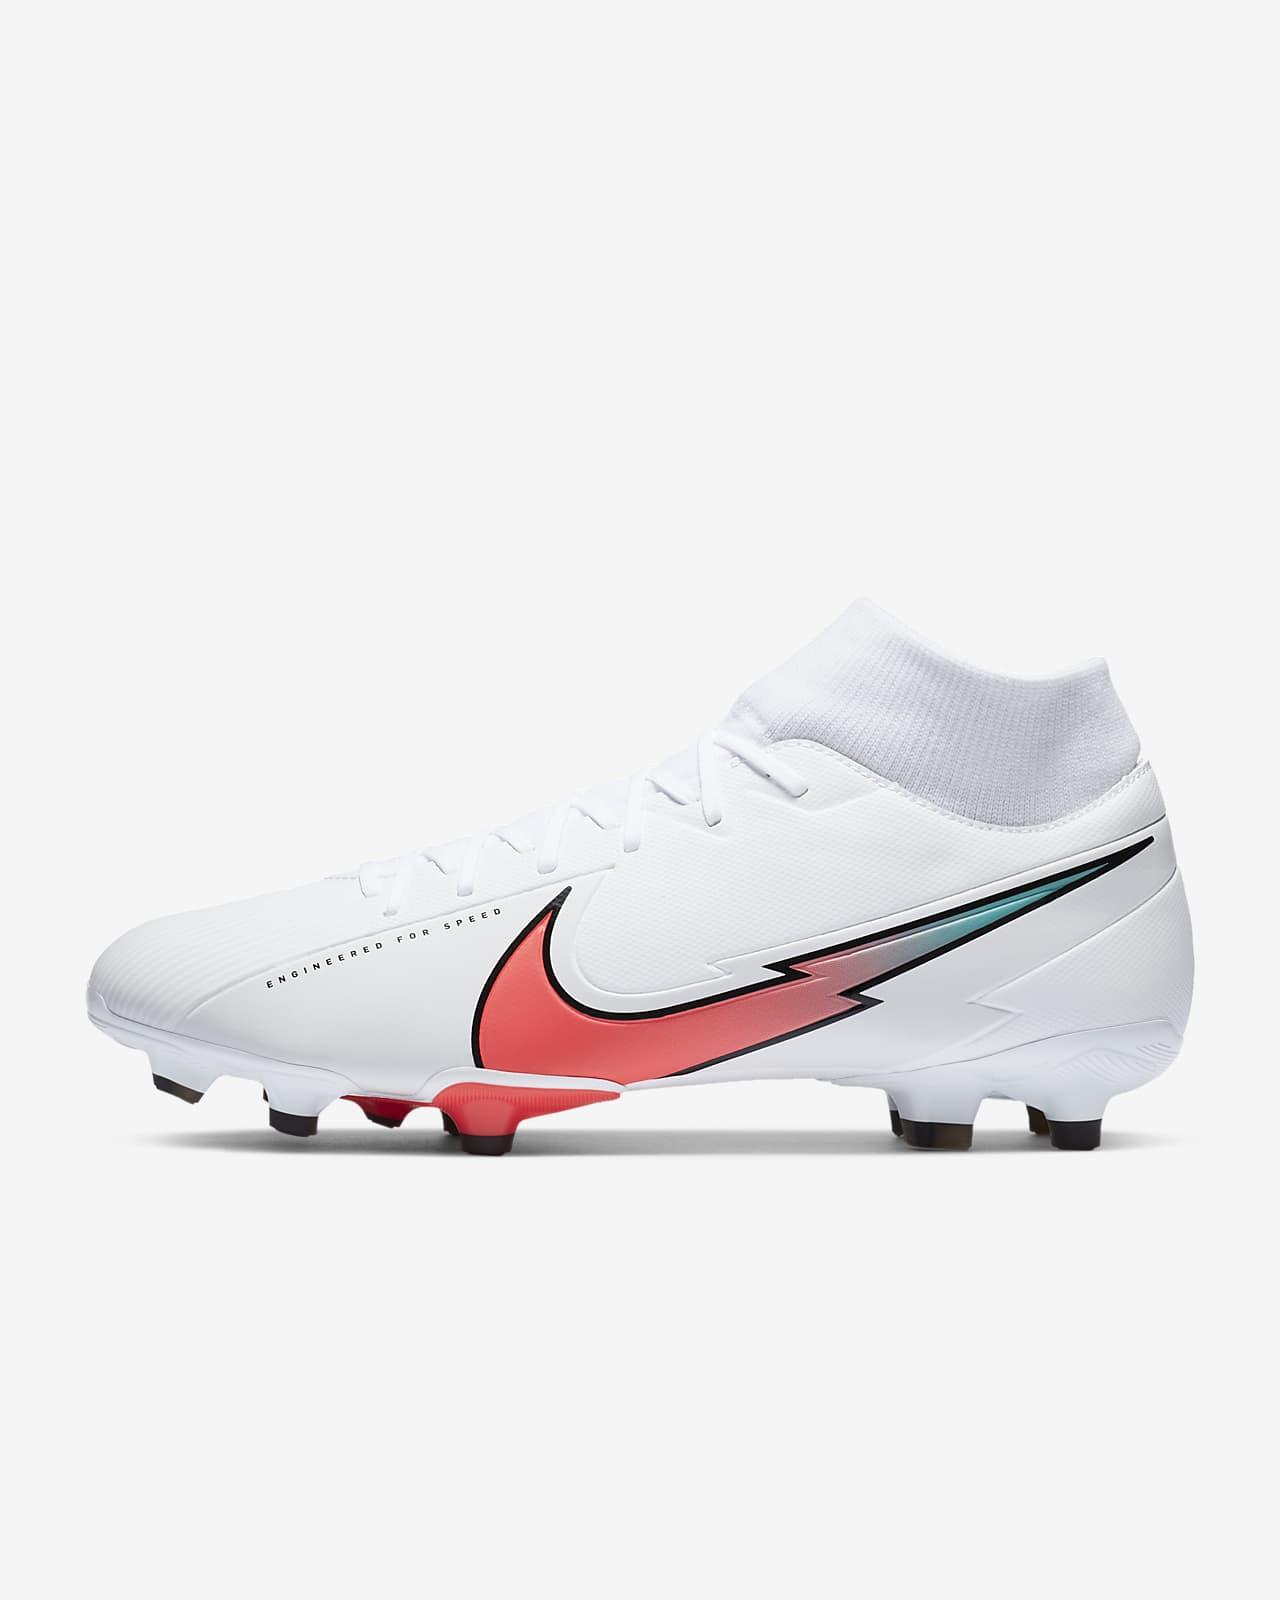 Nike Mercurial Superfly 7 Academy MG Multi-Ground Football Boot